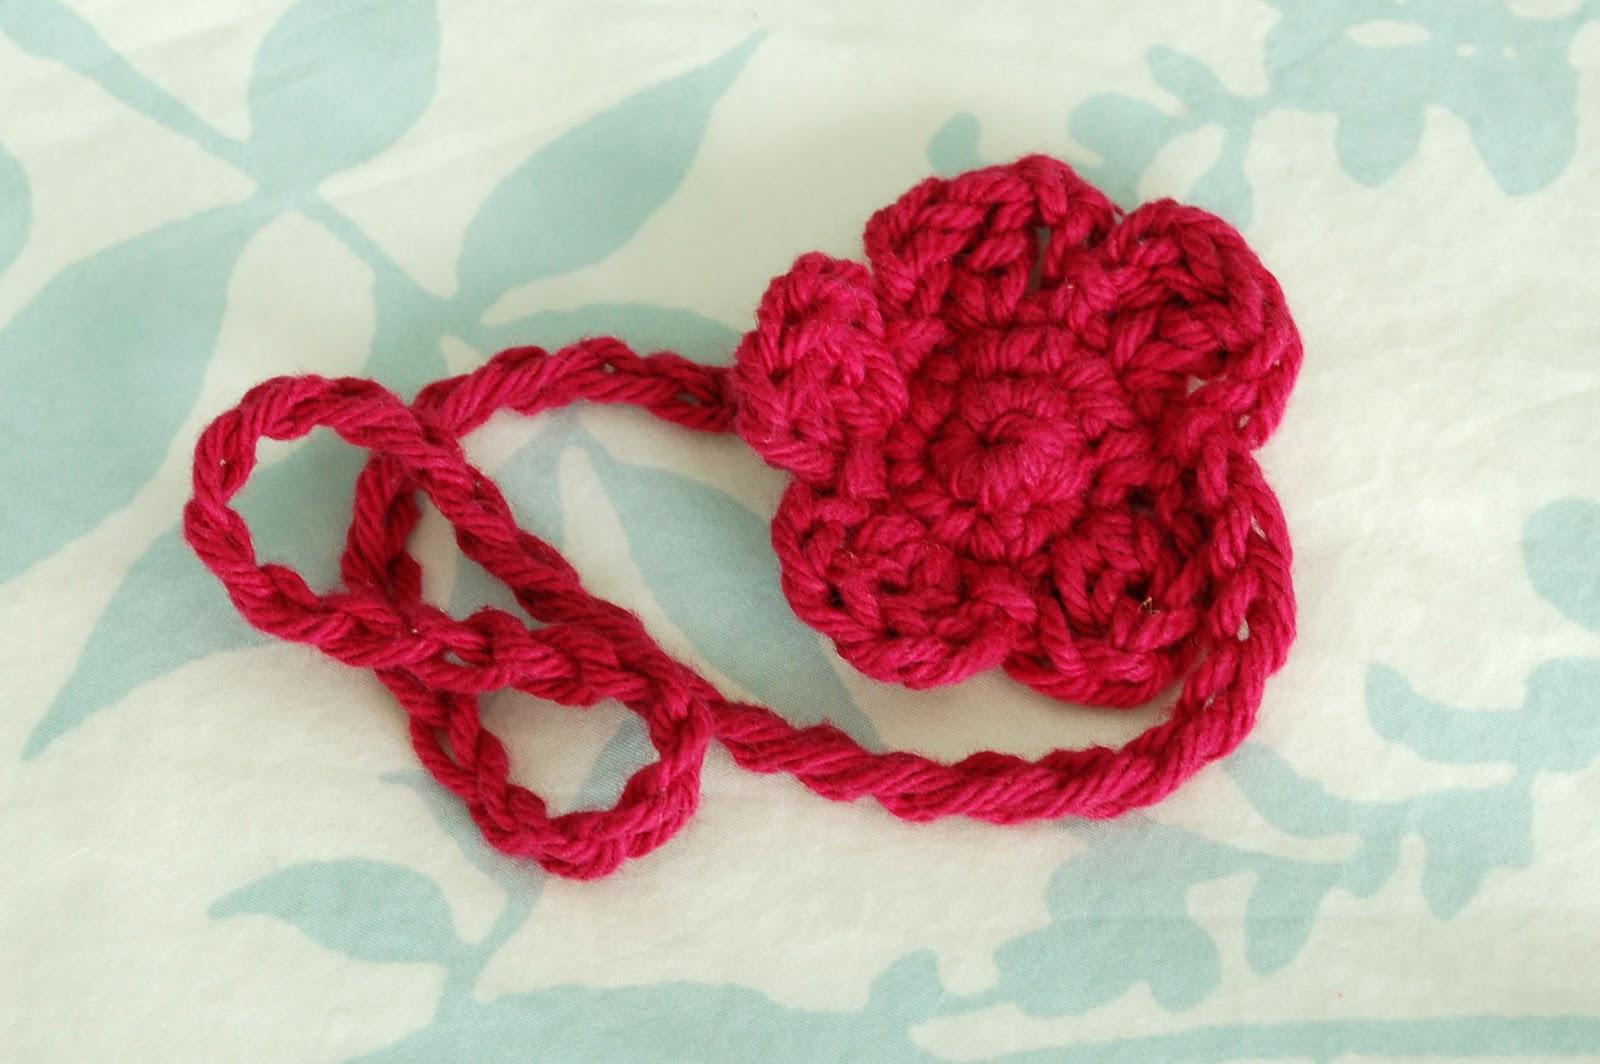 Free Crochet Stretchy Headband Pattern : Alli Crafts: Free Pattern: Baby Headband